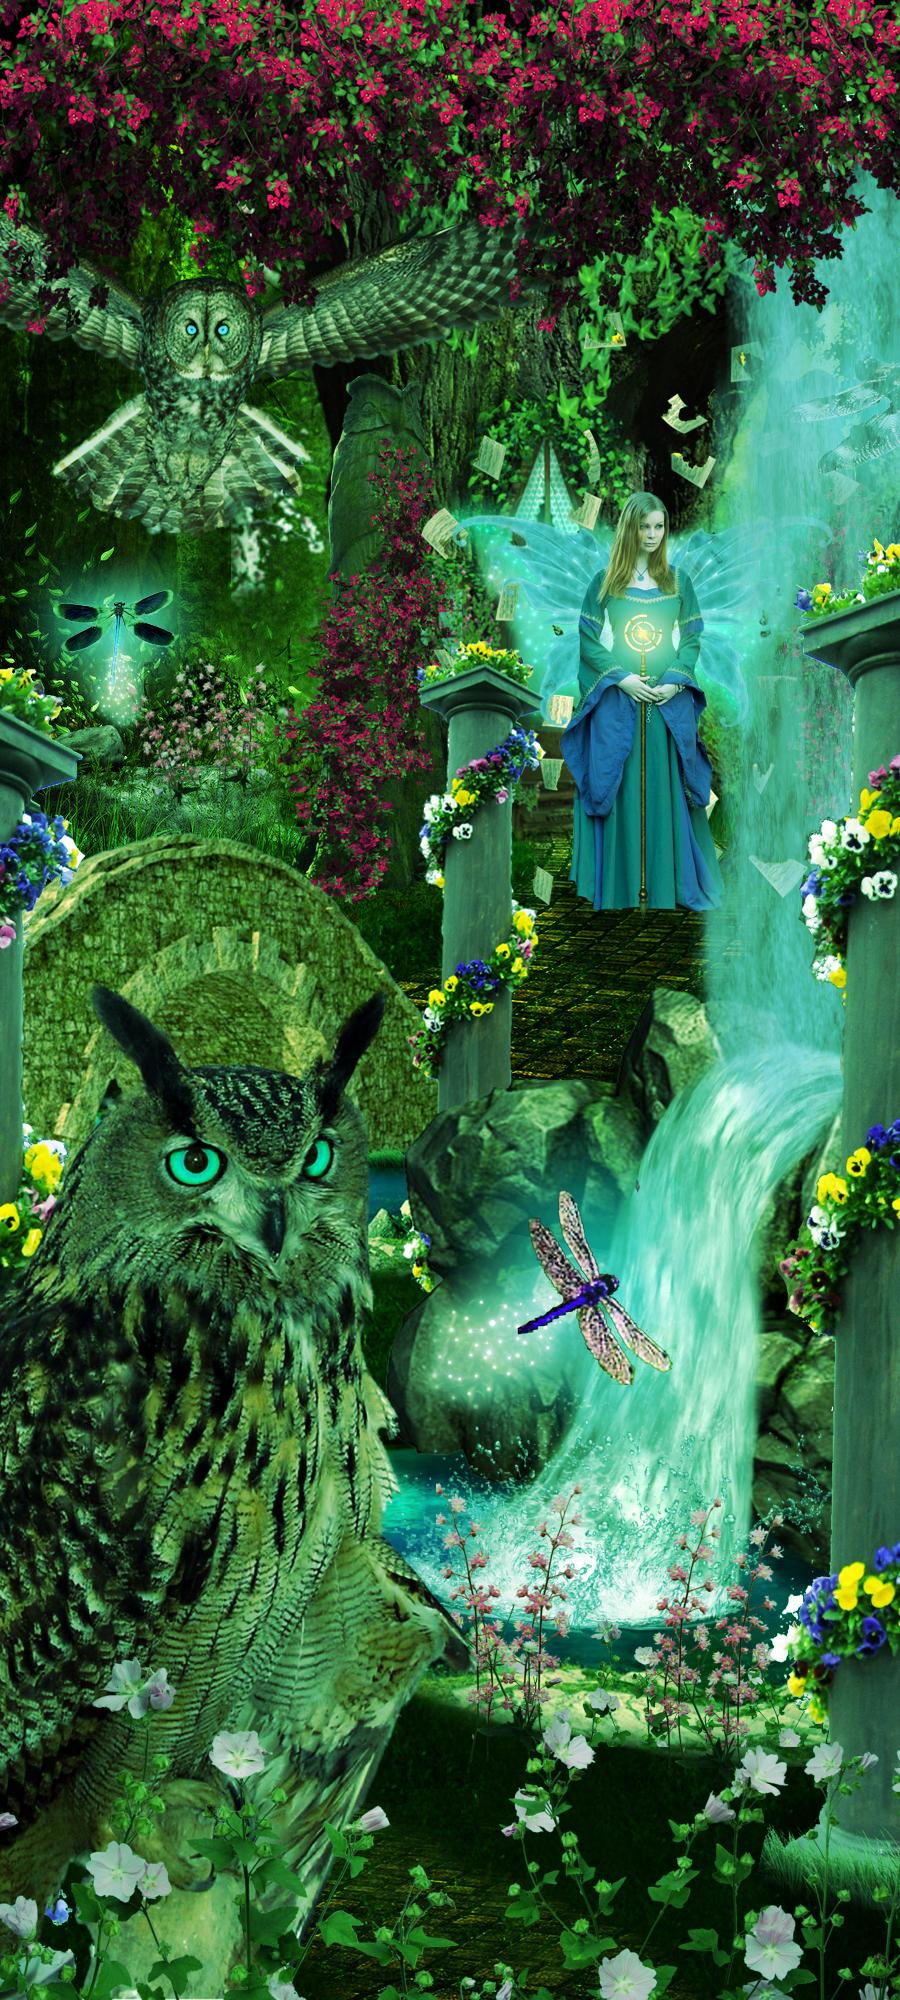 The Wisdom Fairy